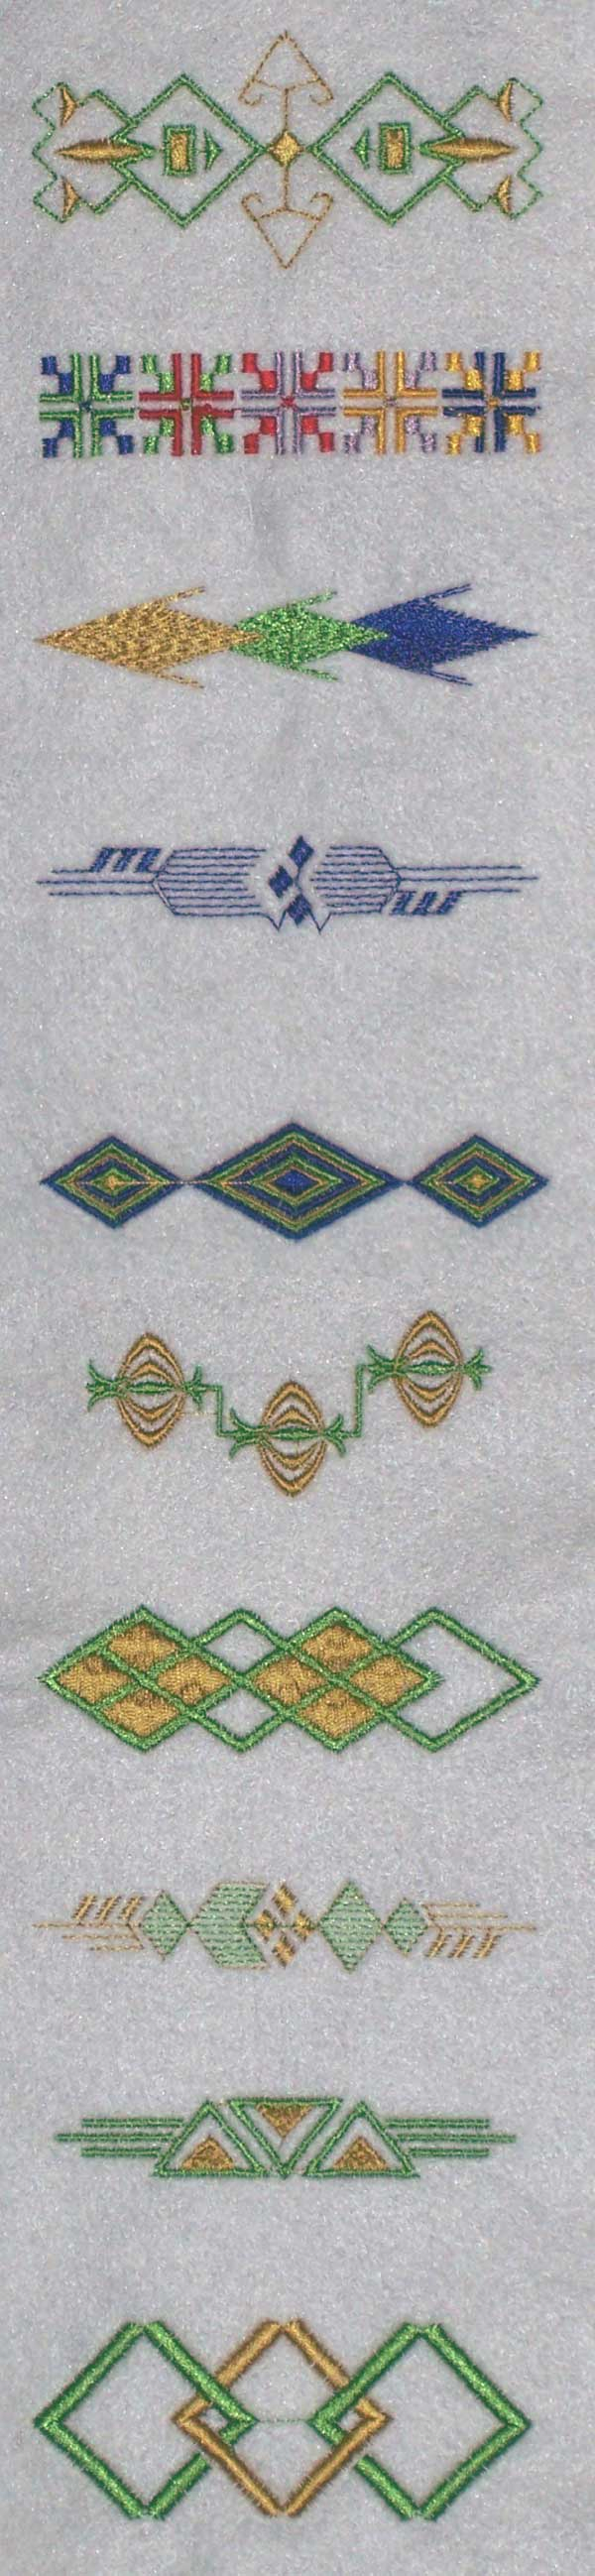 Geometric borders machine embroidery designs ebay